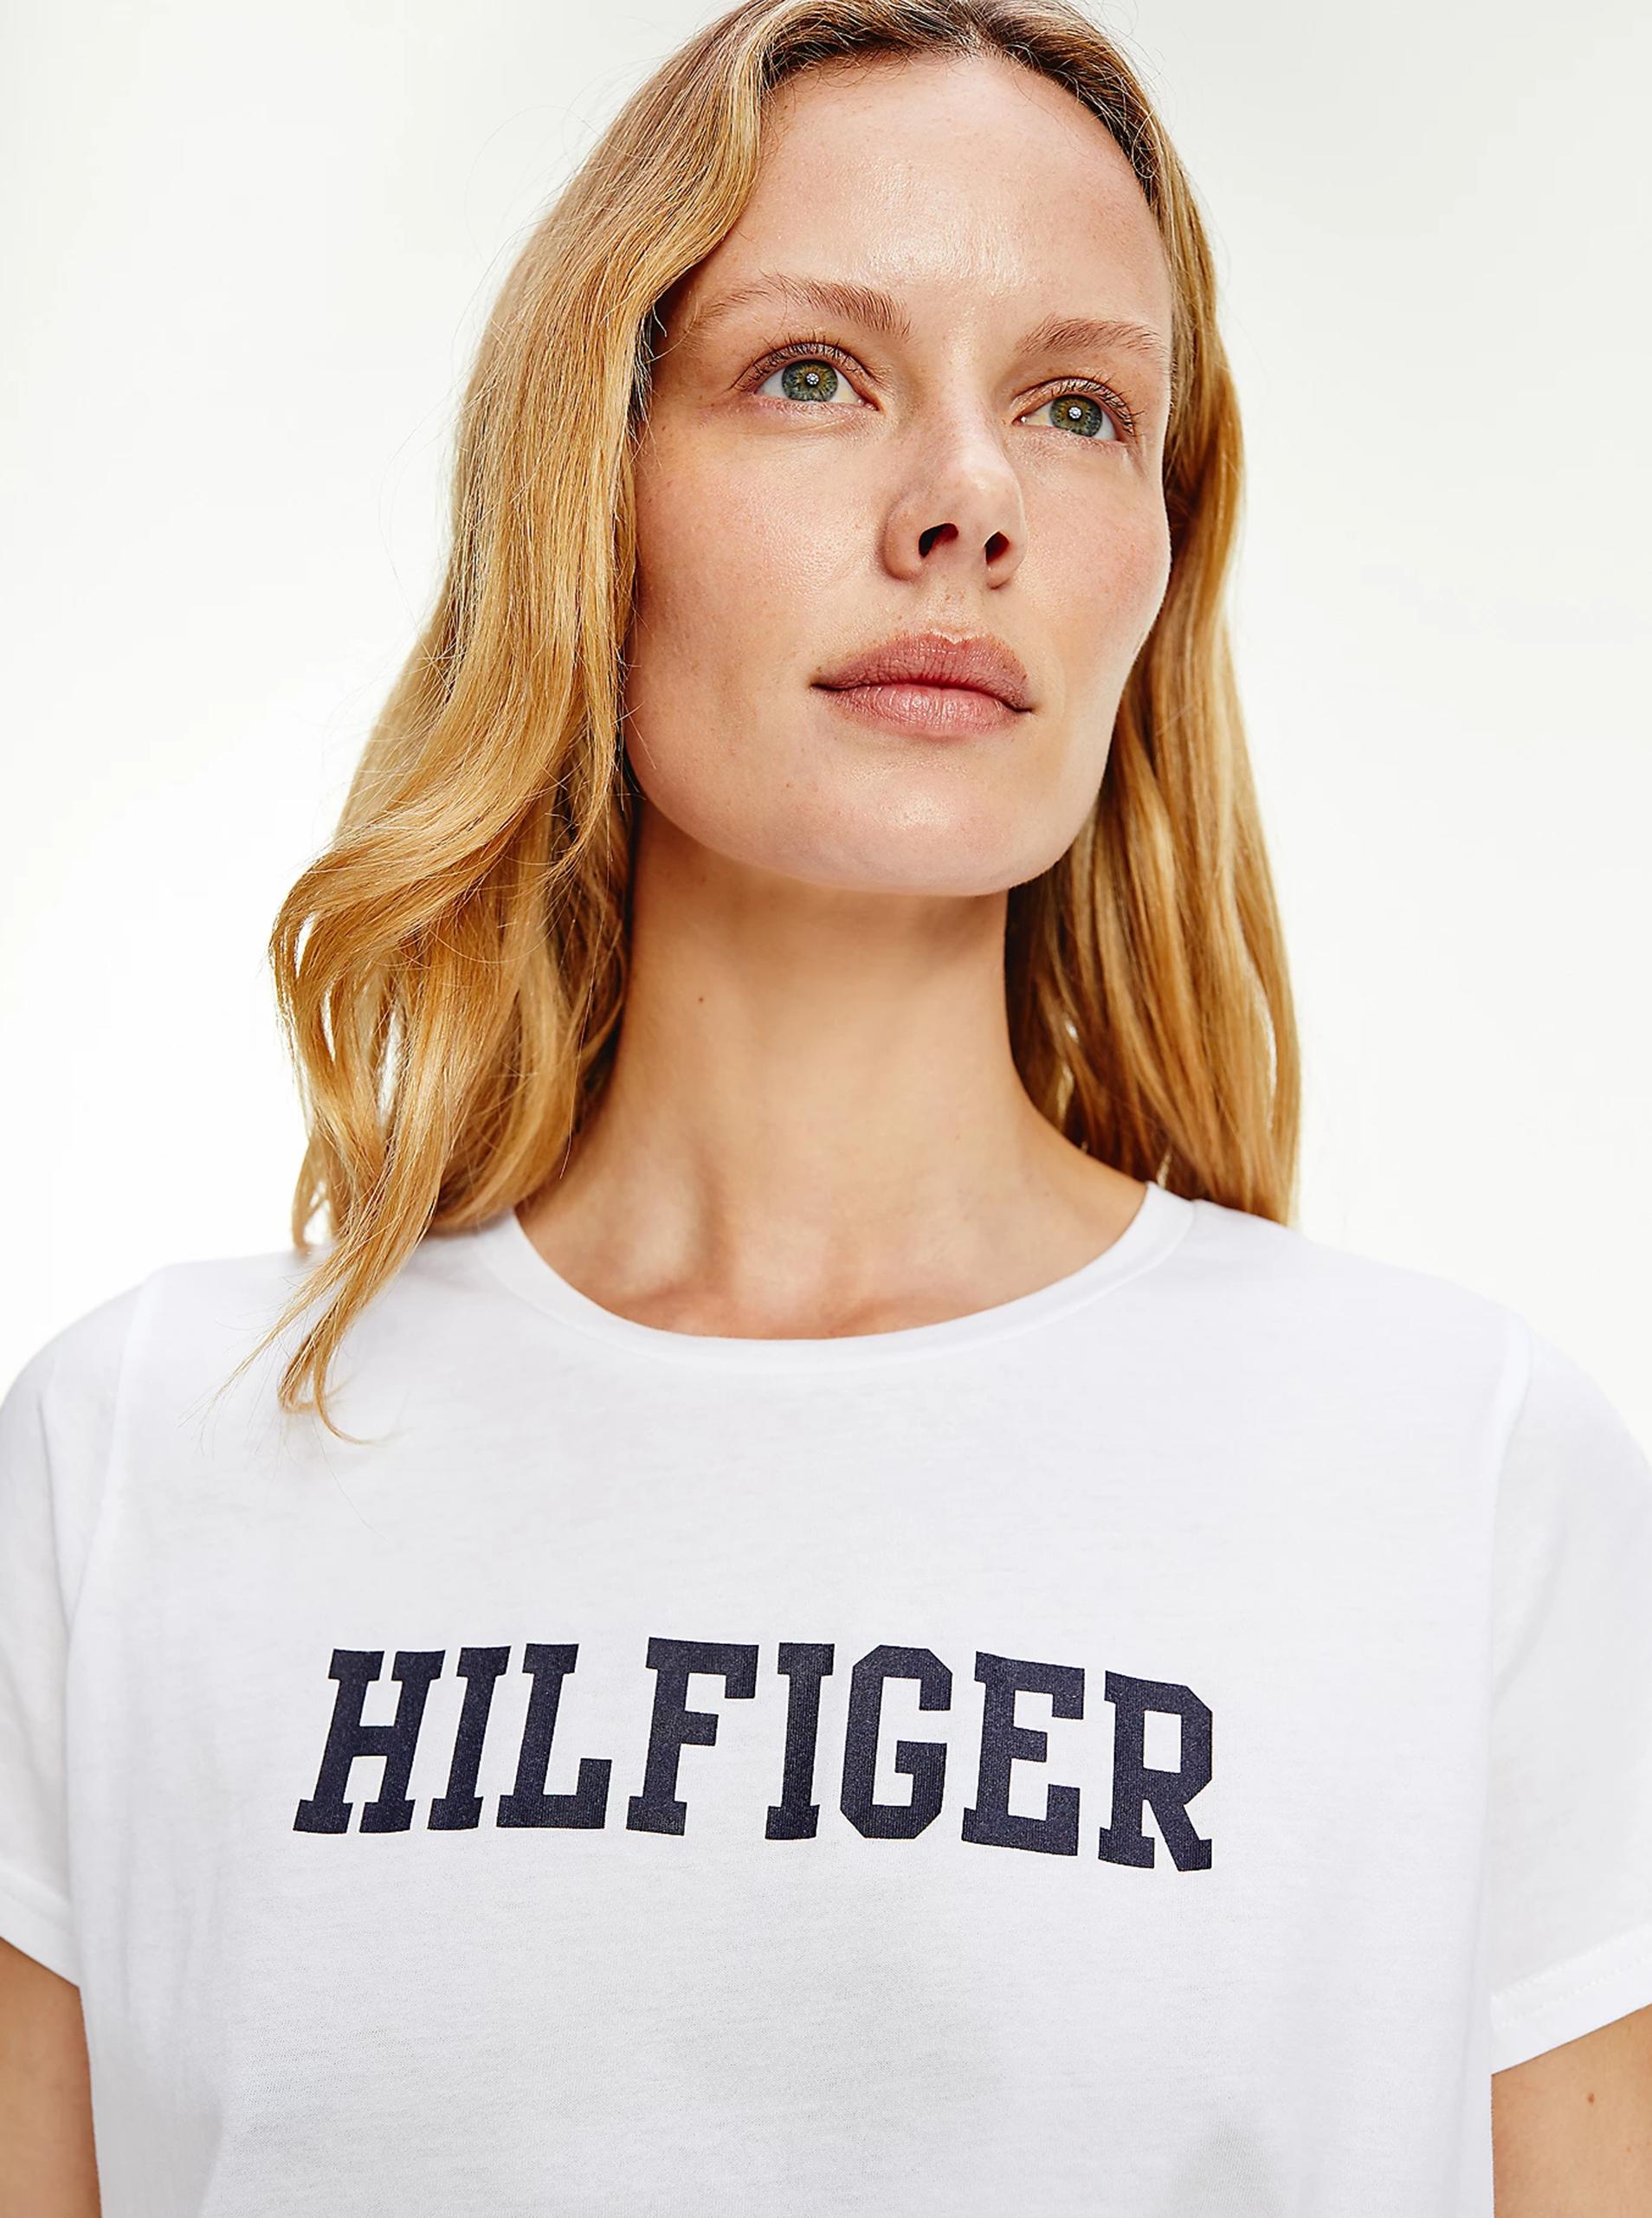 Tommy Hilfiger bijela majica s logotipom